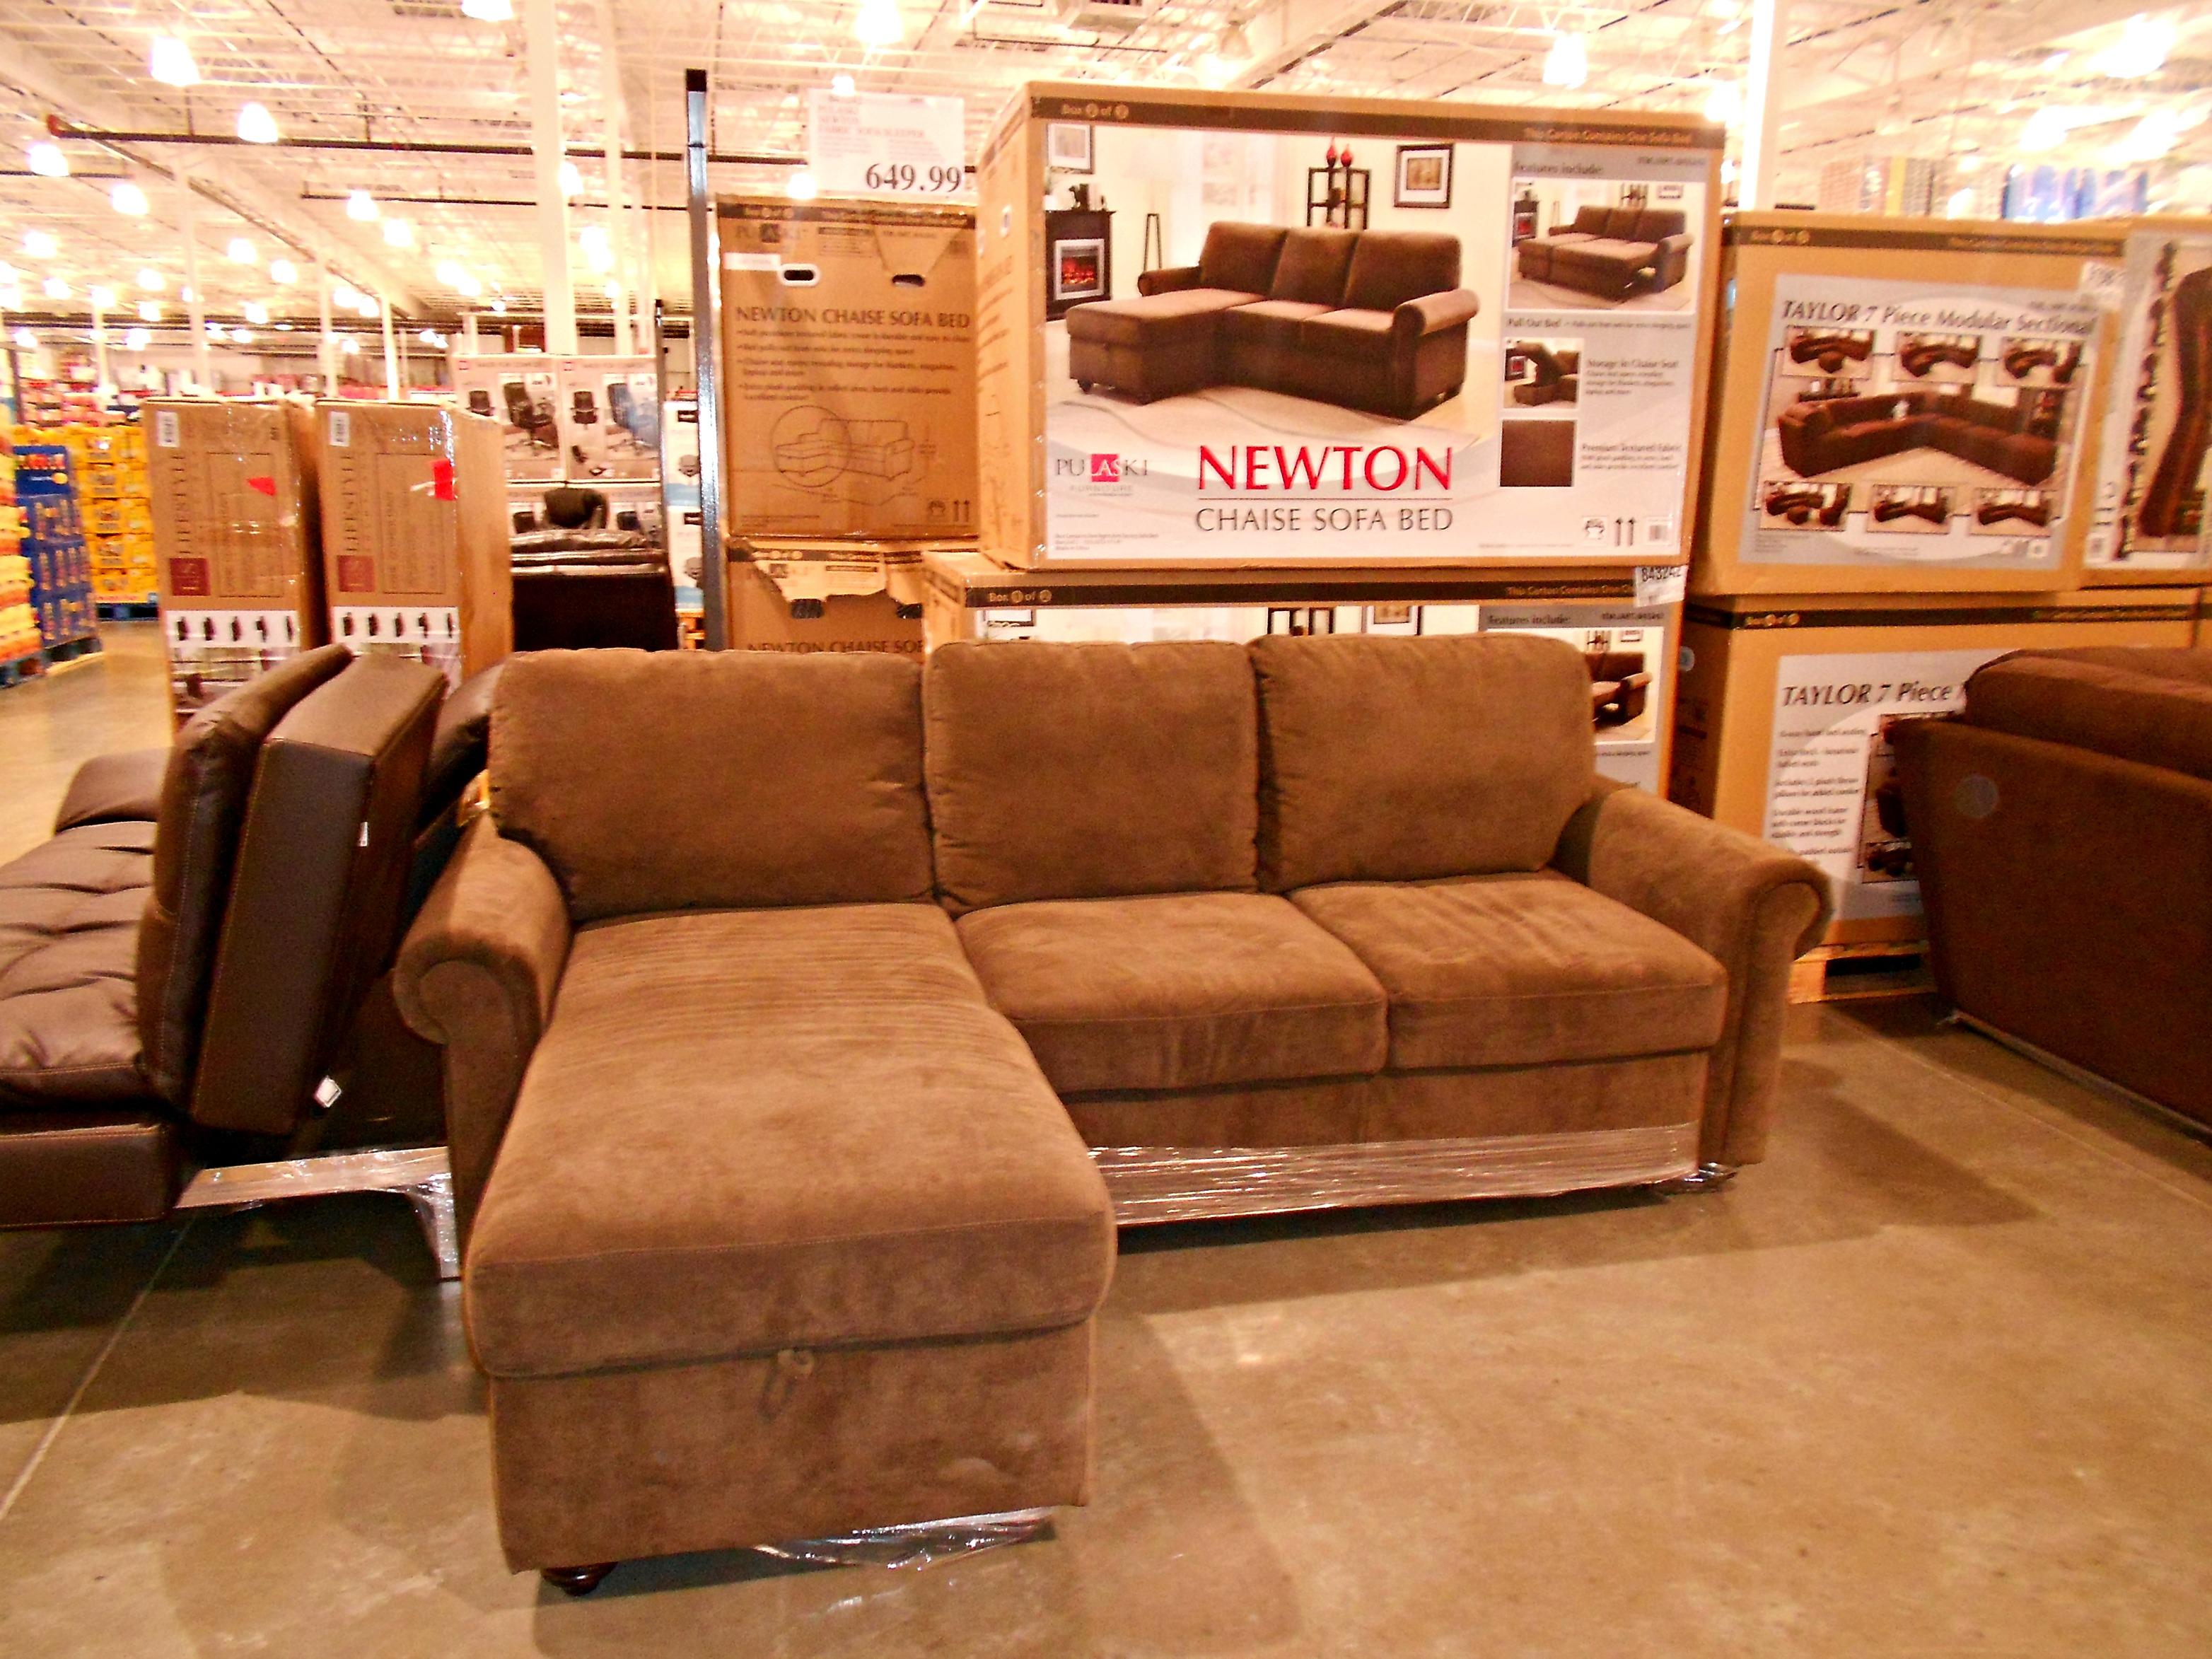 newton chaise sofa bed at costco 649